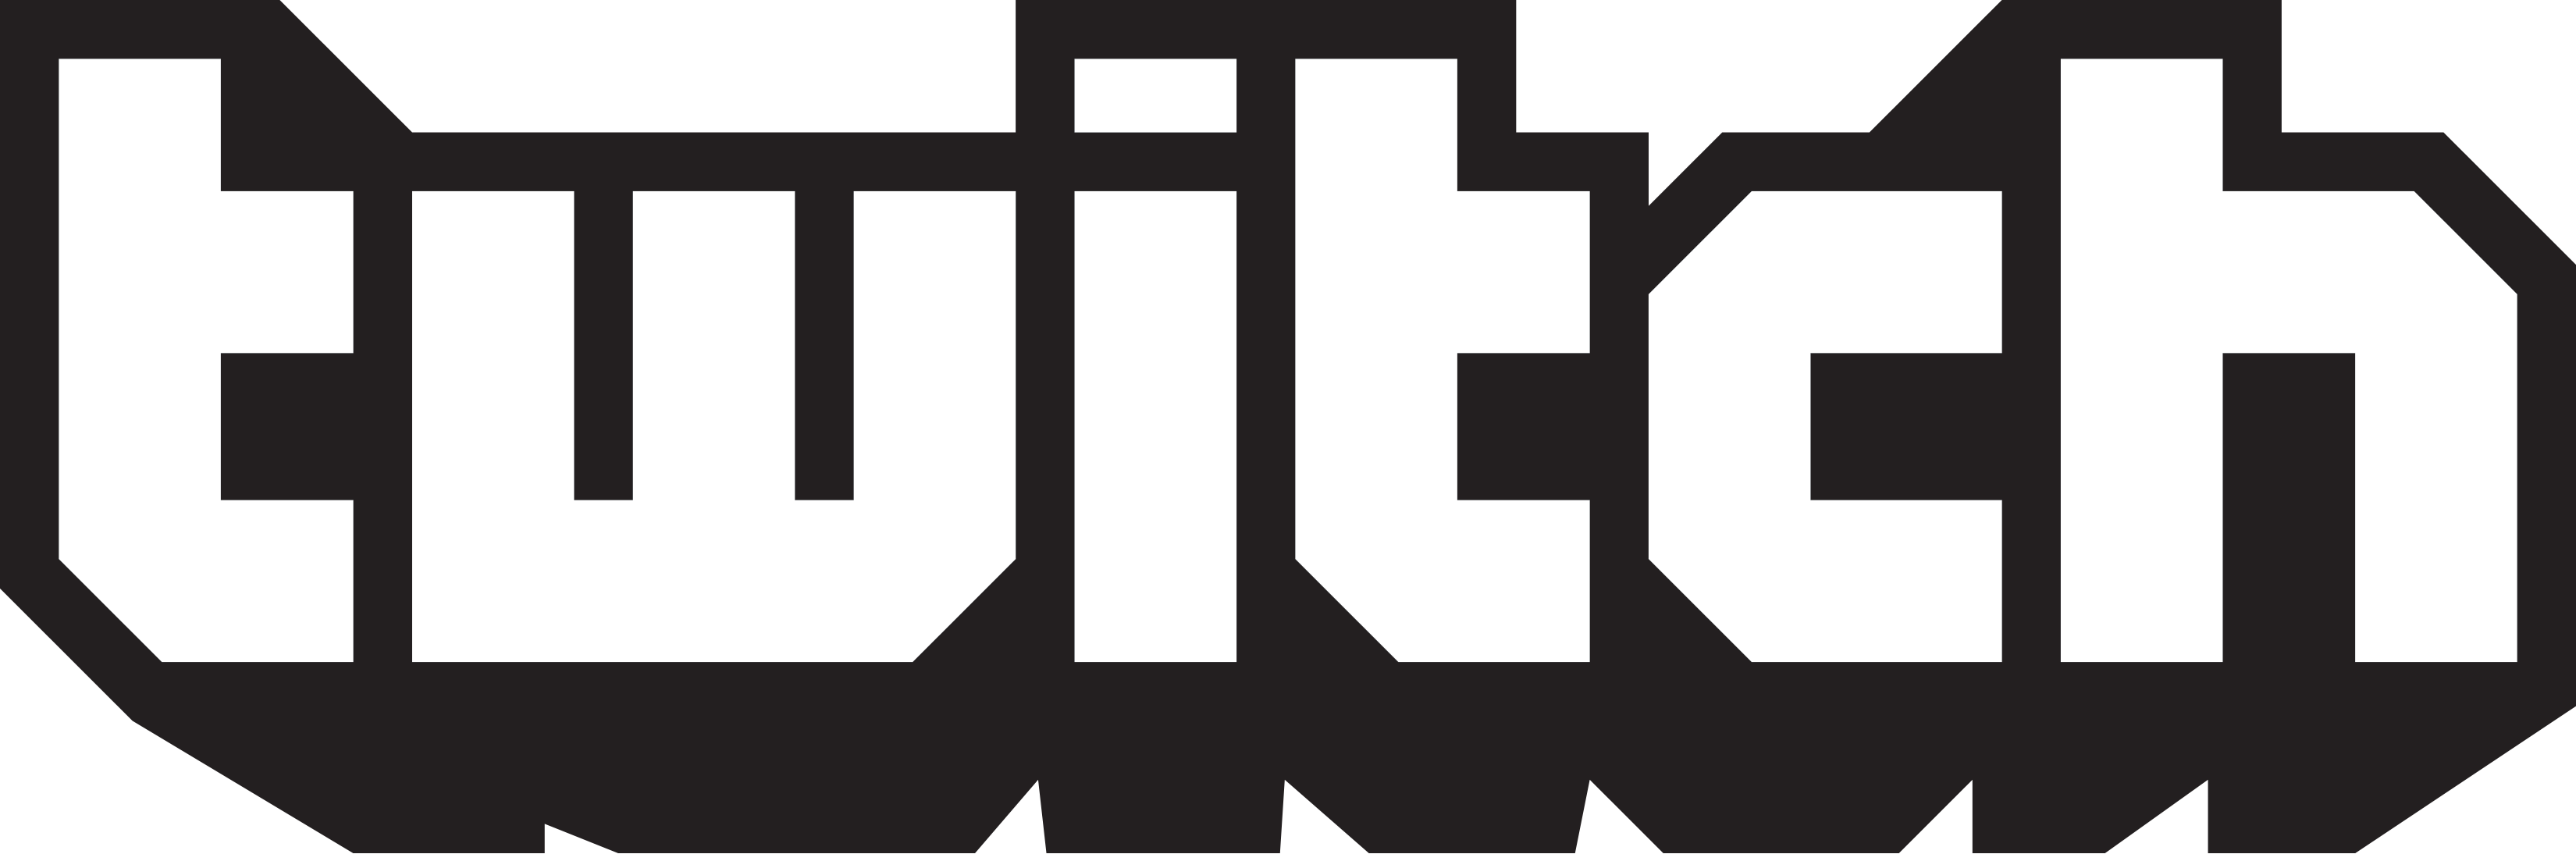 threeman on twitch.tv